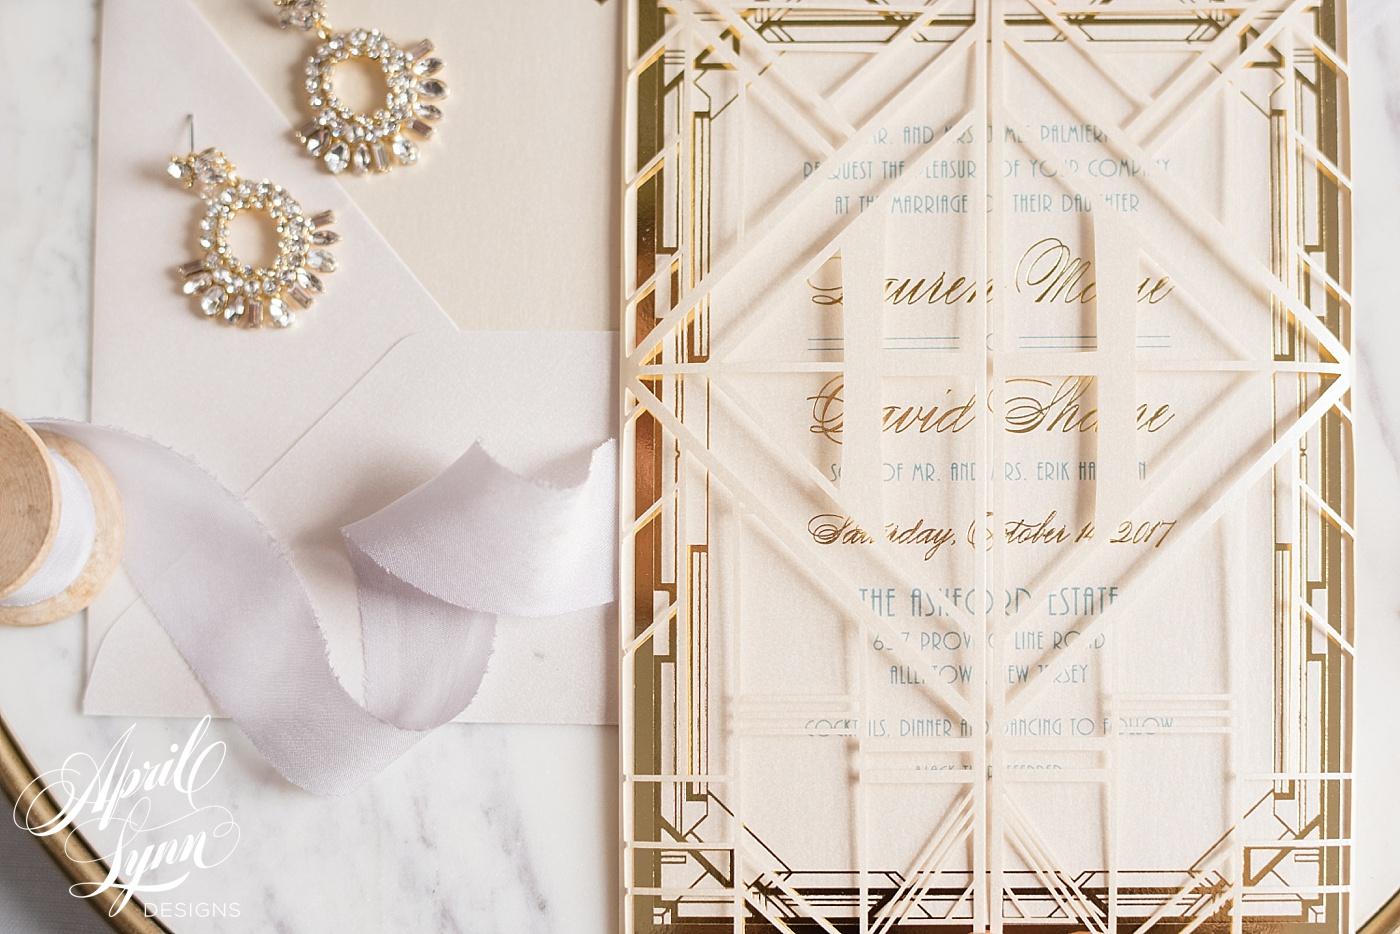 April_Lynn_Designs_Ashford_Estate_Lauren_Dave_Lasercut_Wedding_Invitation_Blue_Gold_Ivory_Luxury_Philadelphia_2